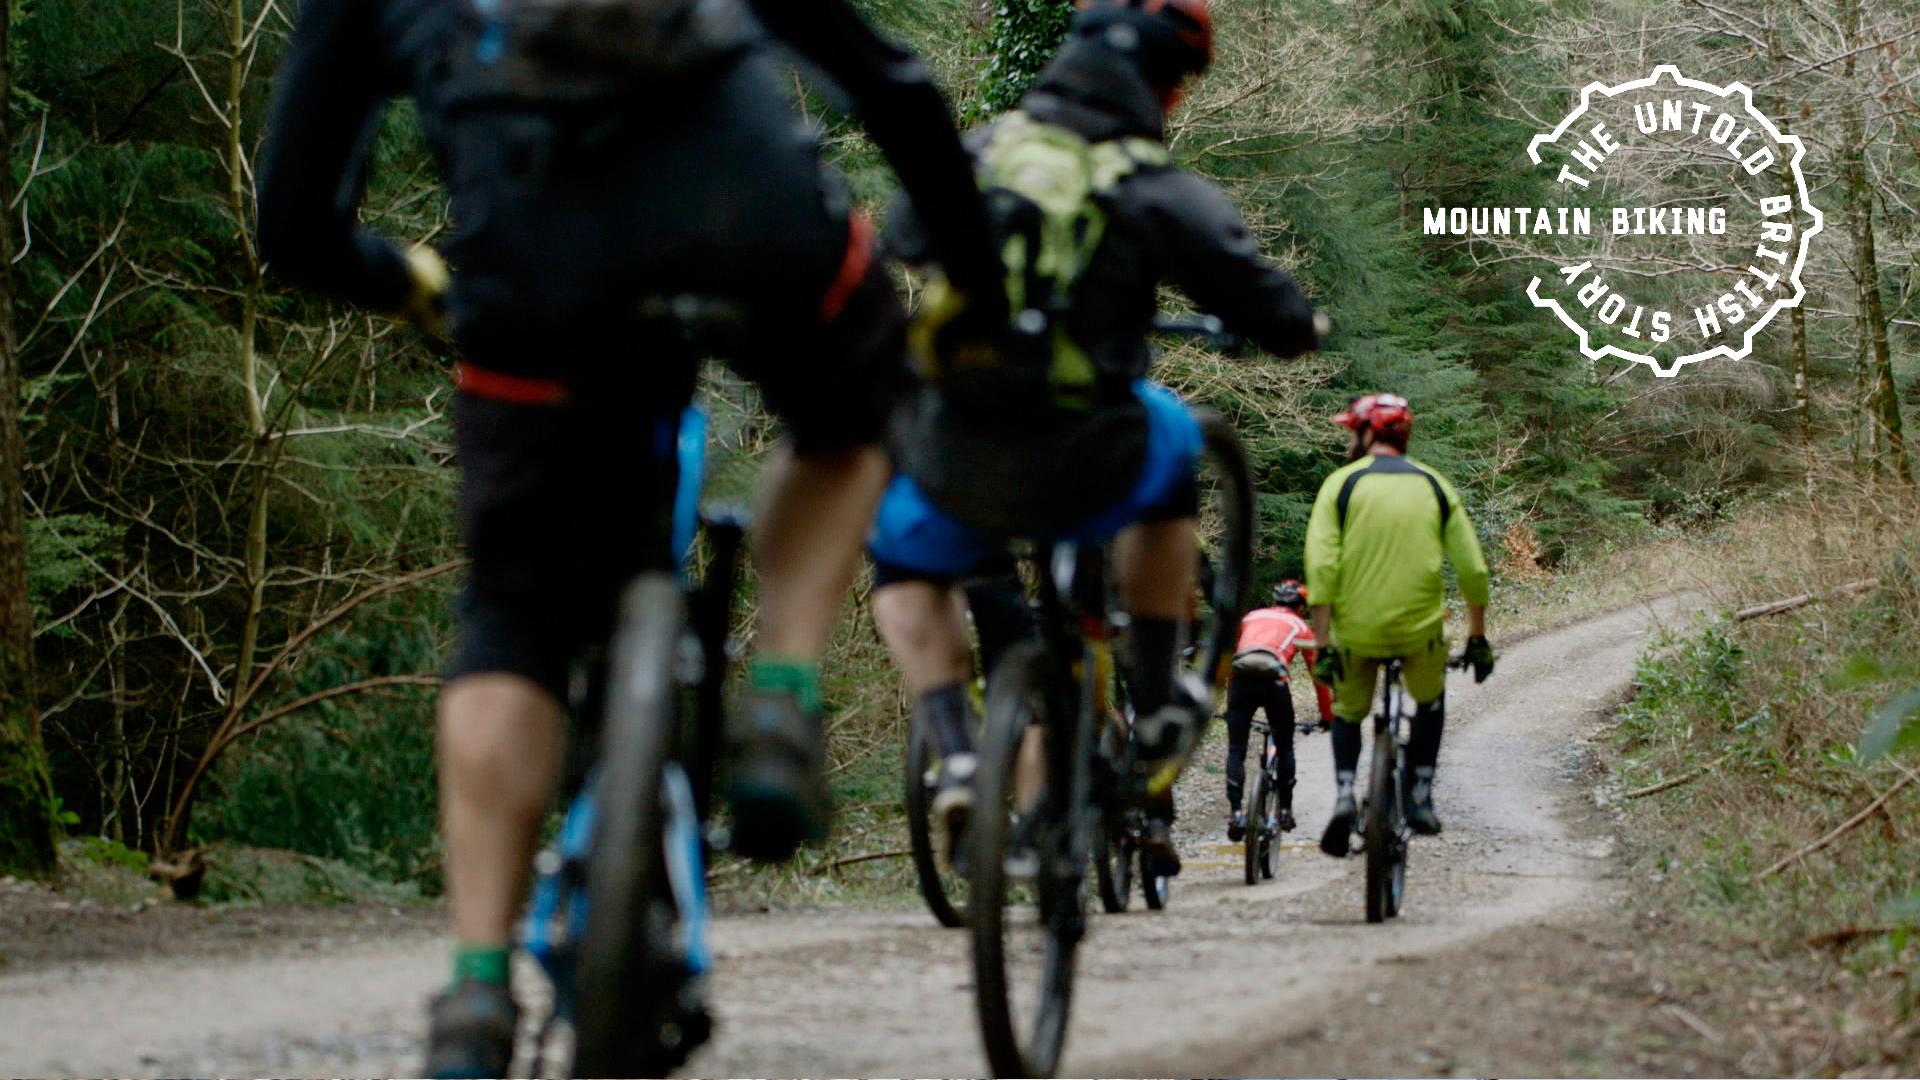 Mountain Biking - The Untold British Story on Amazon Prime Video UK